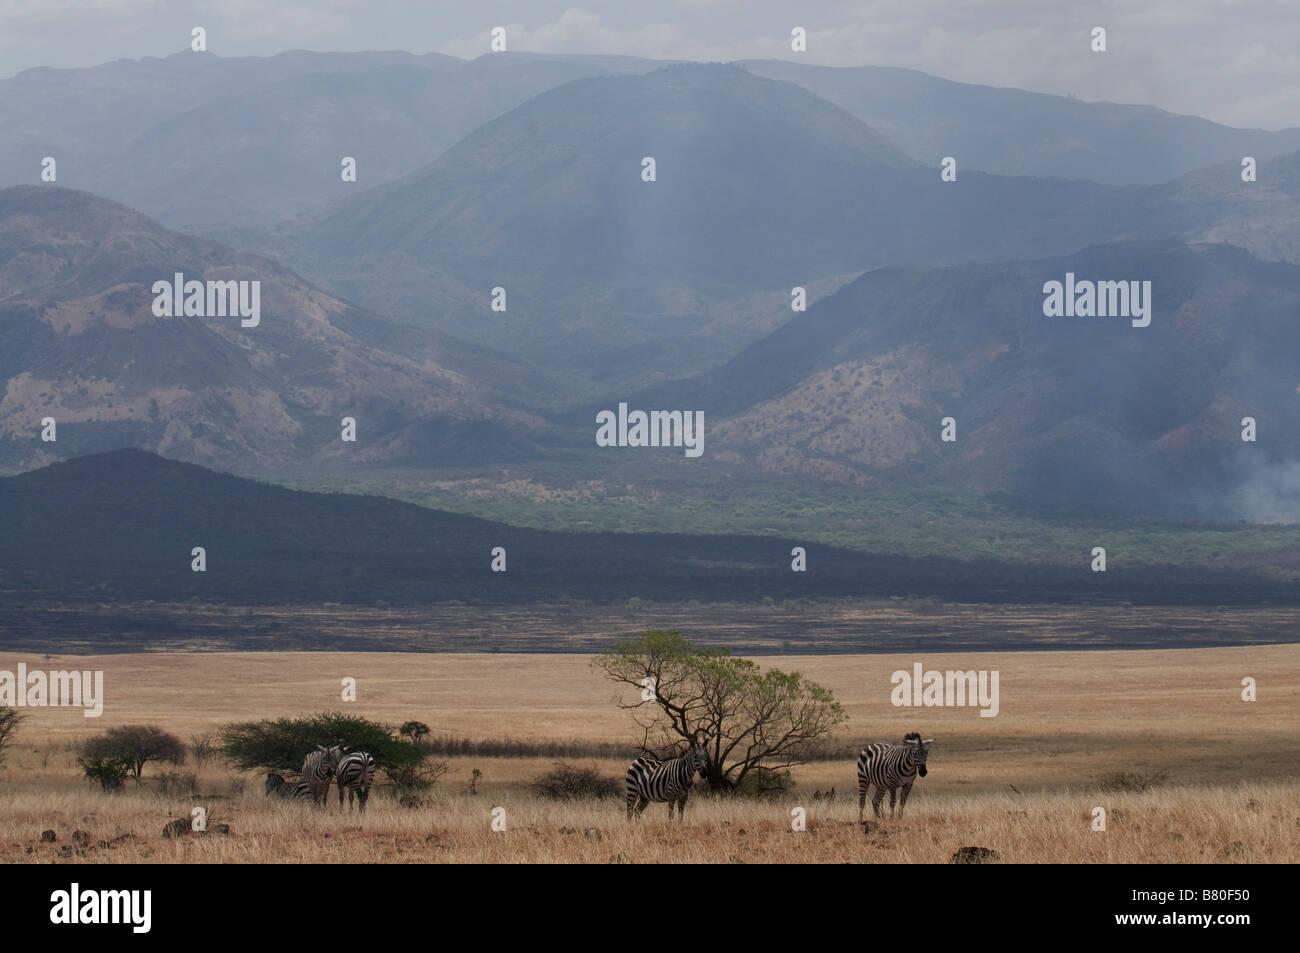 Wilderbeest in the Nechisar National Park Ethiopia Africa Stock Photo